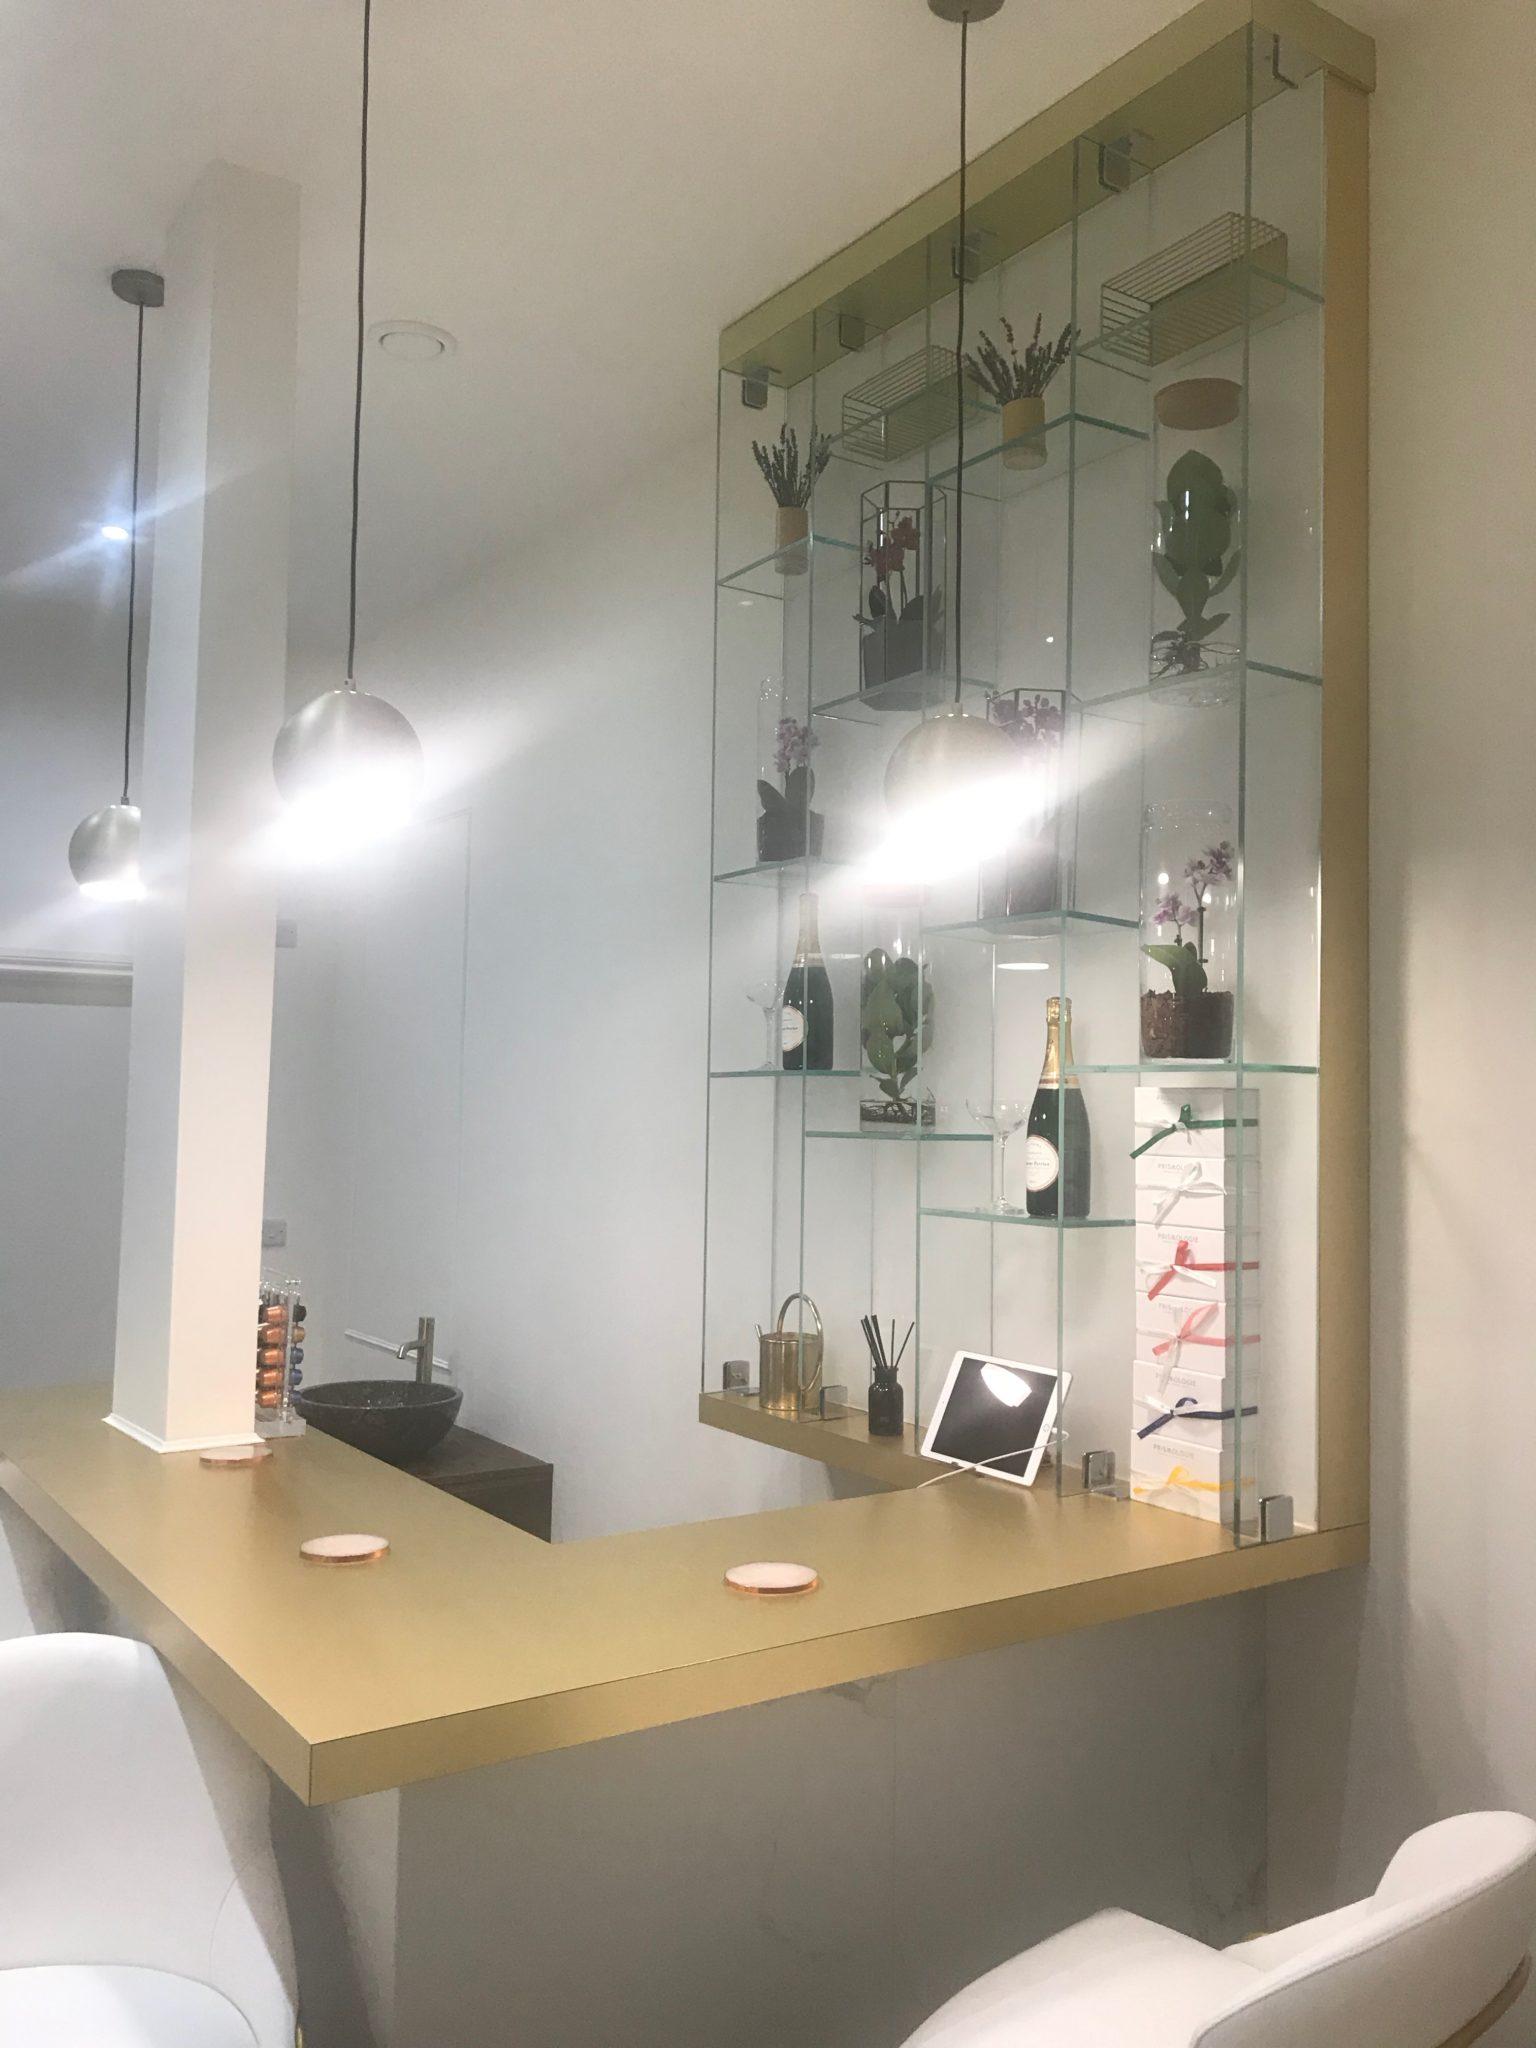 Monnay Beauty Salon Design